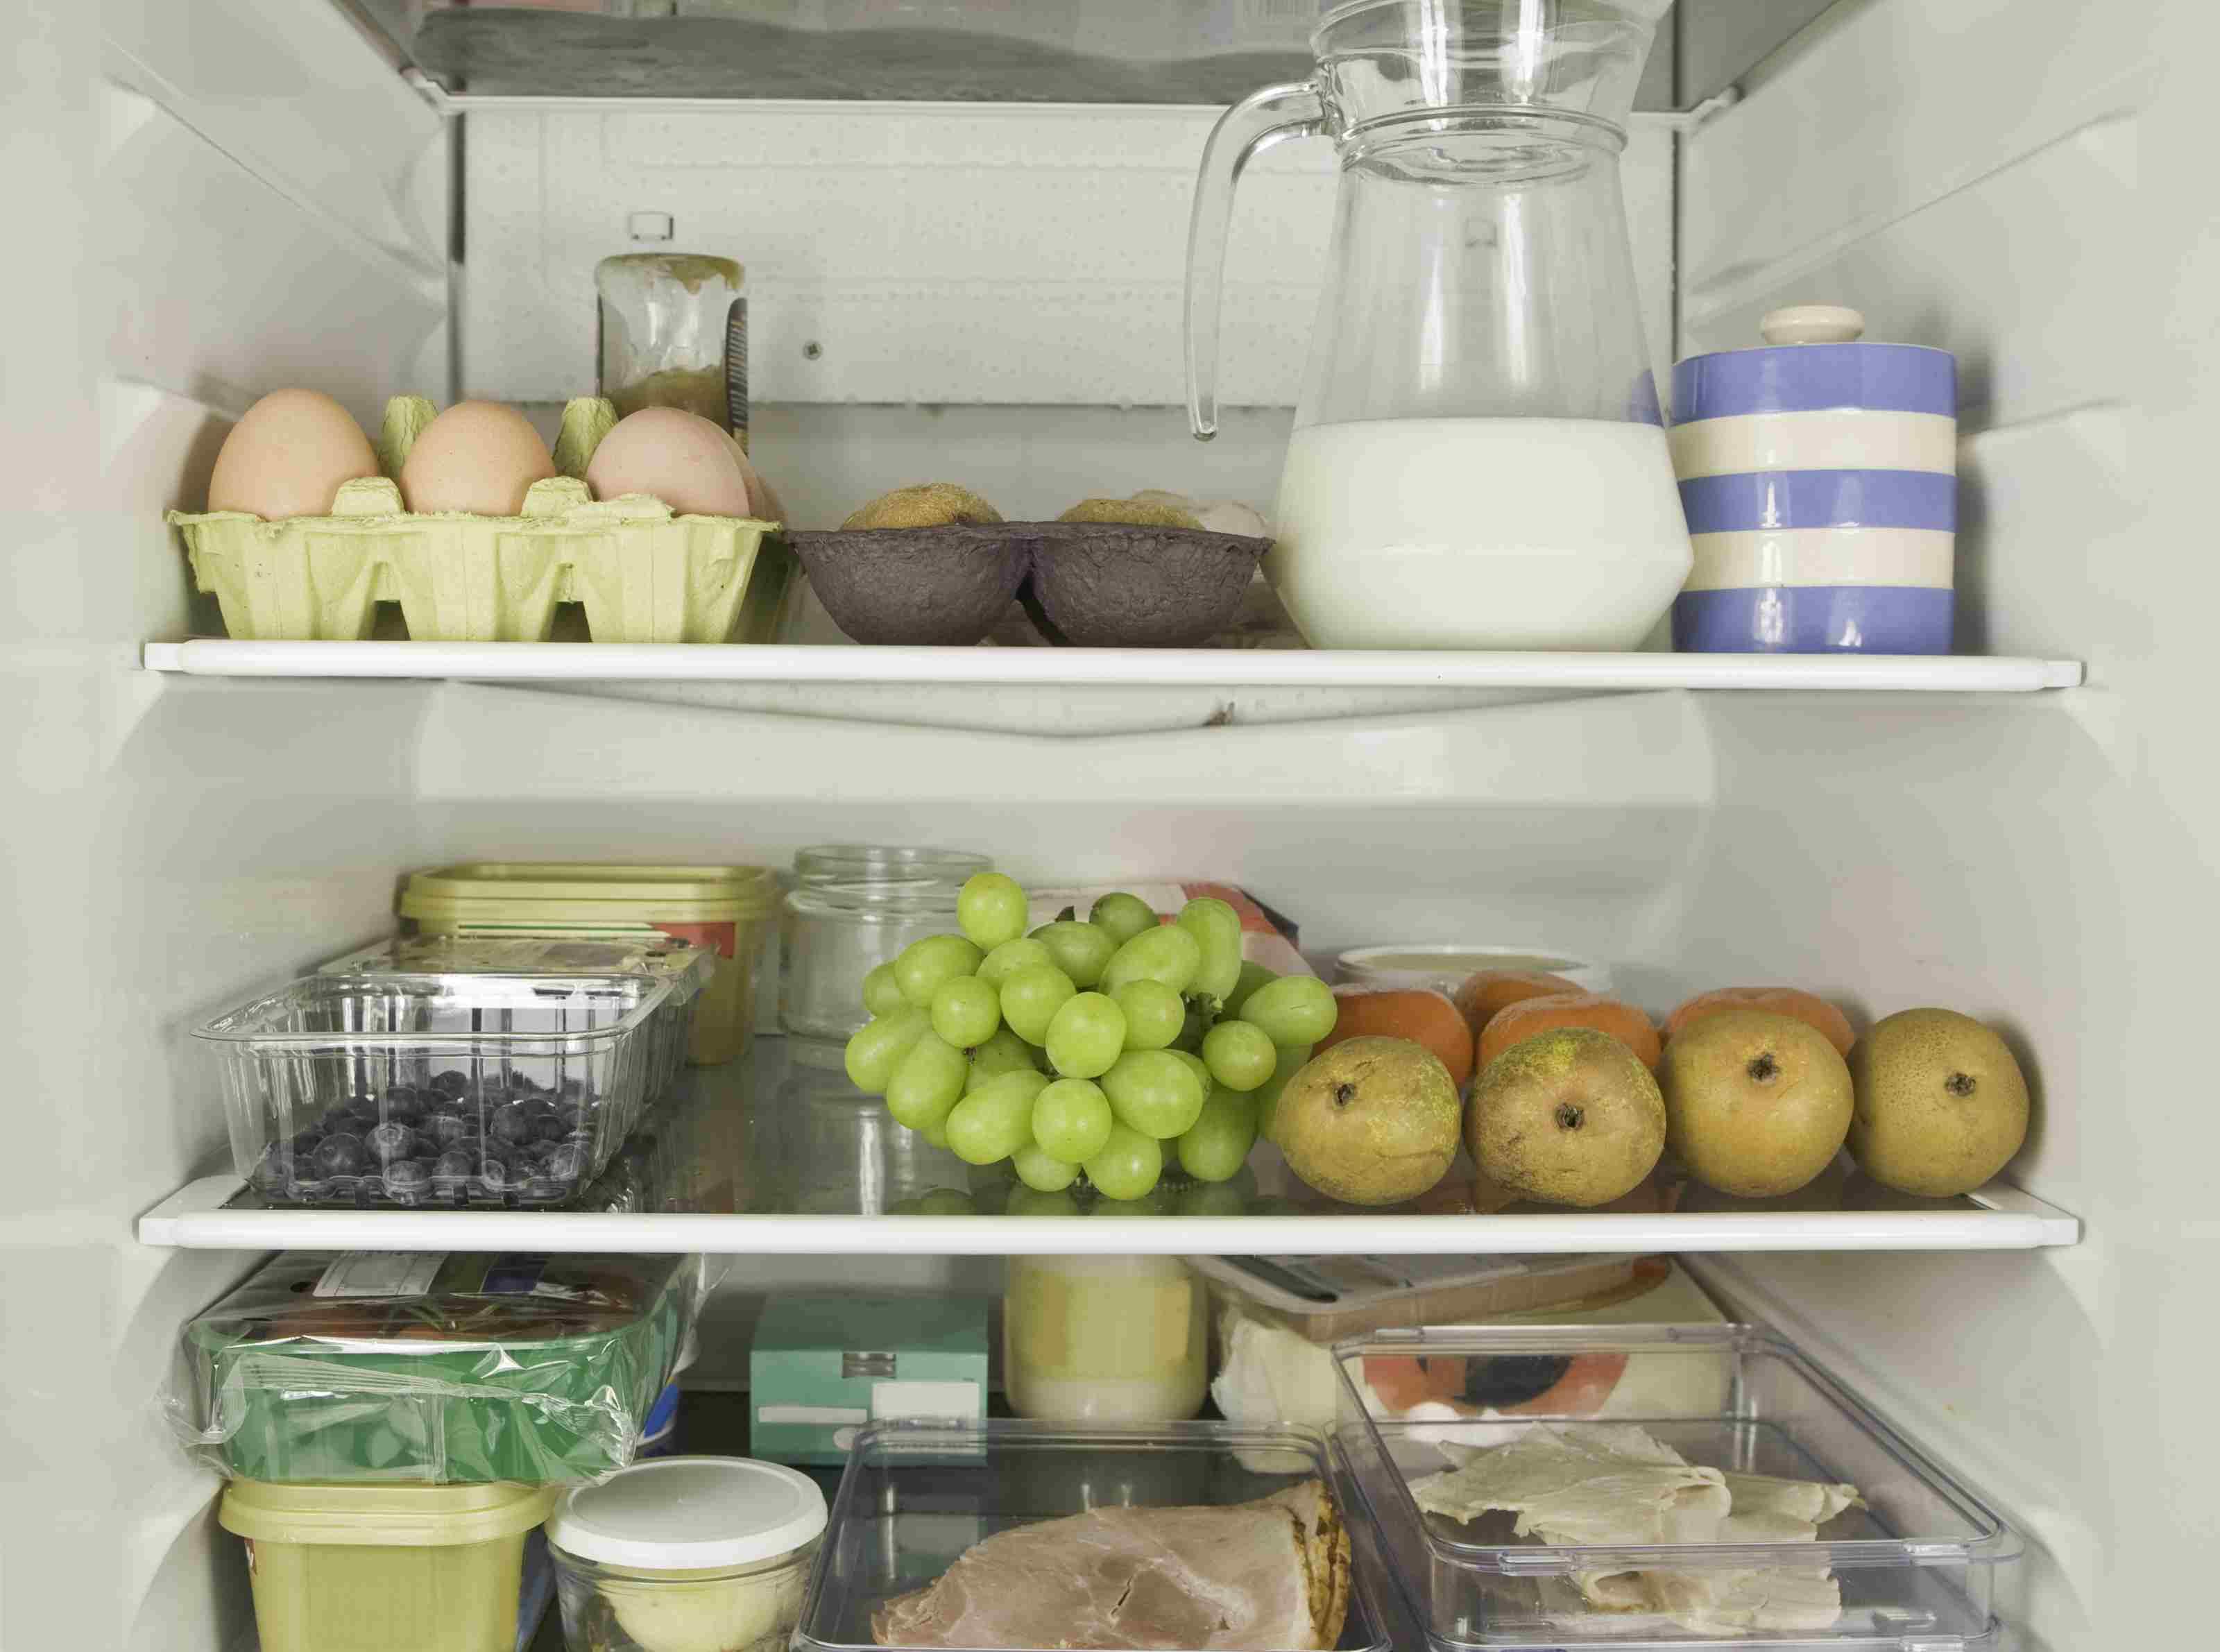 A refrigerator full of food.